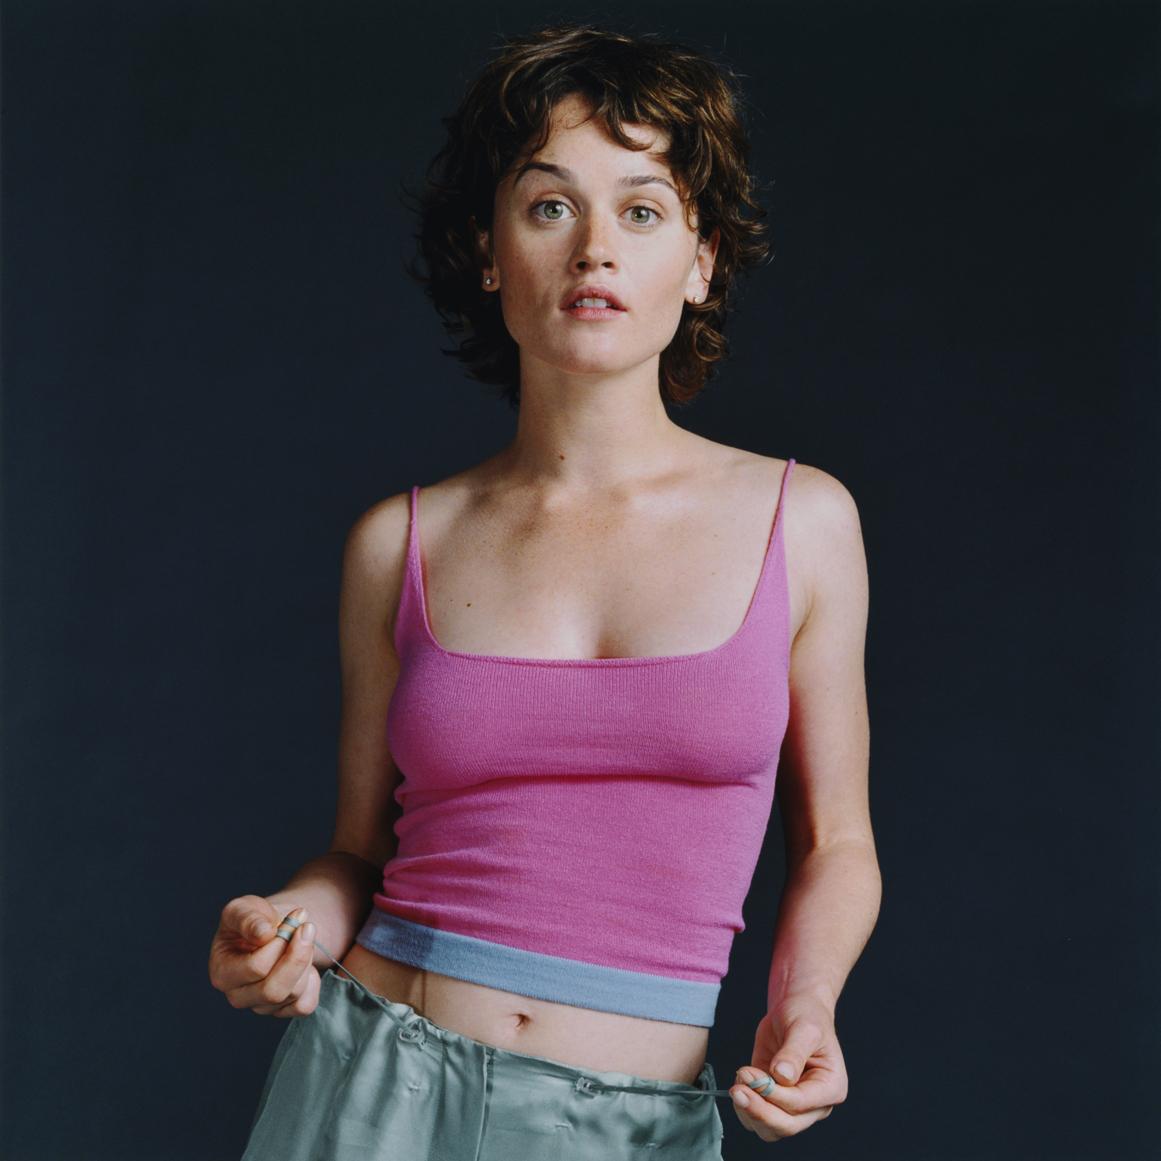 Zara Phillips